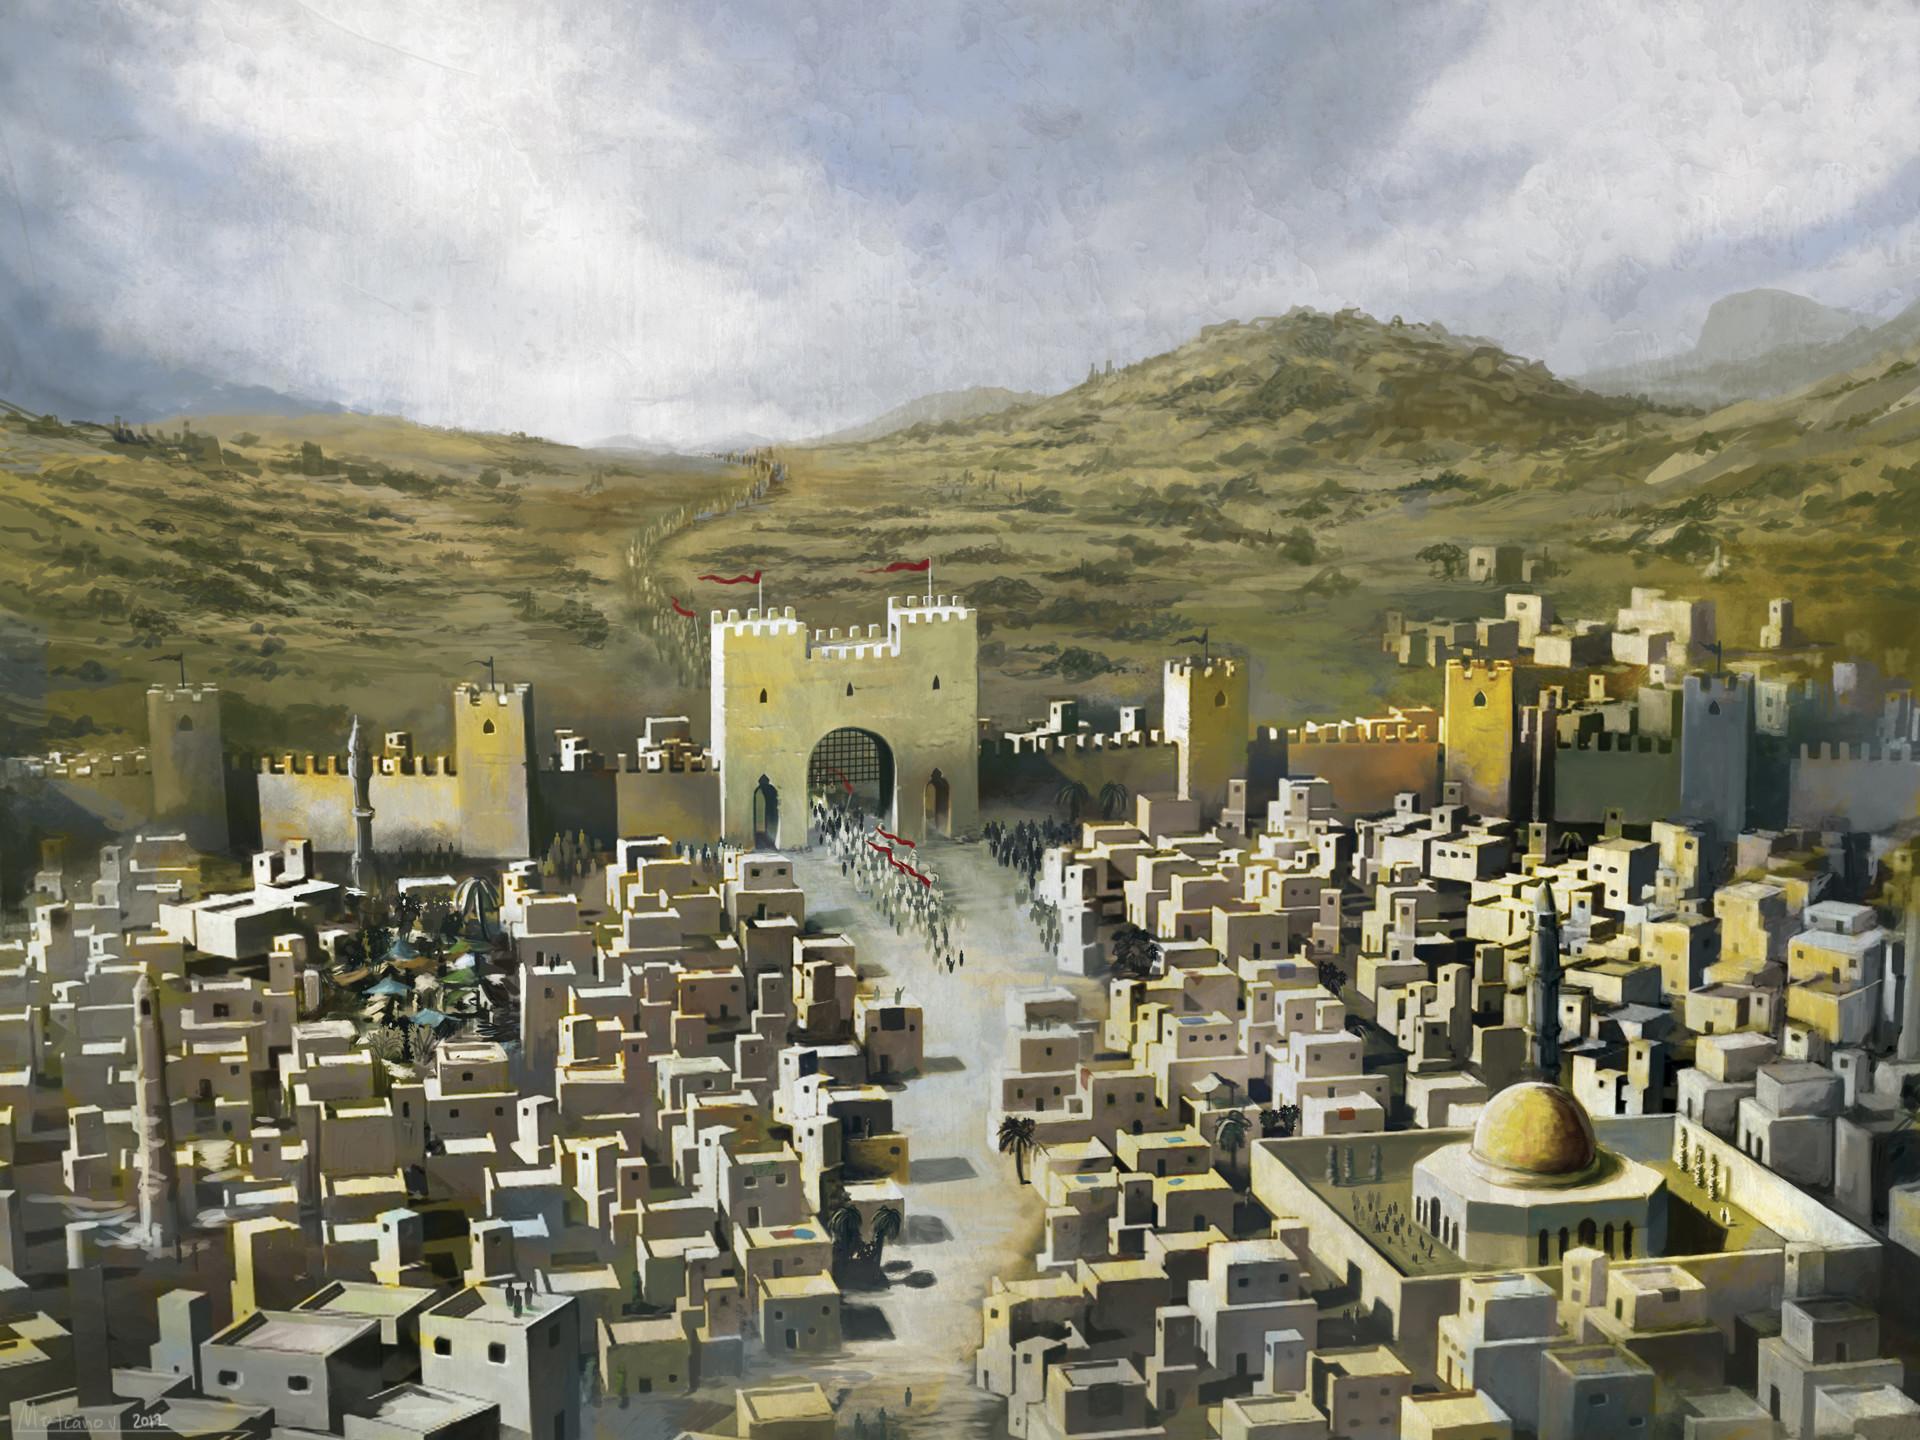 … Crusader Kings 2 Loading Screen by zenarion